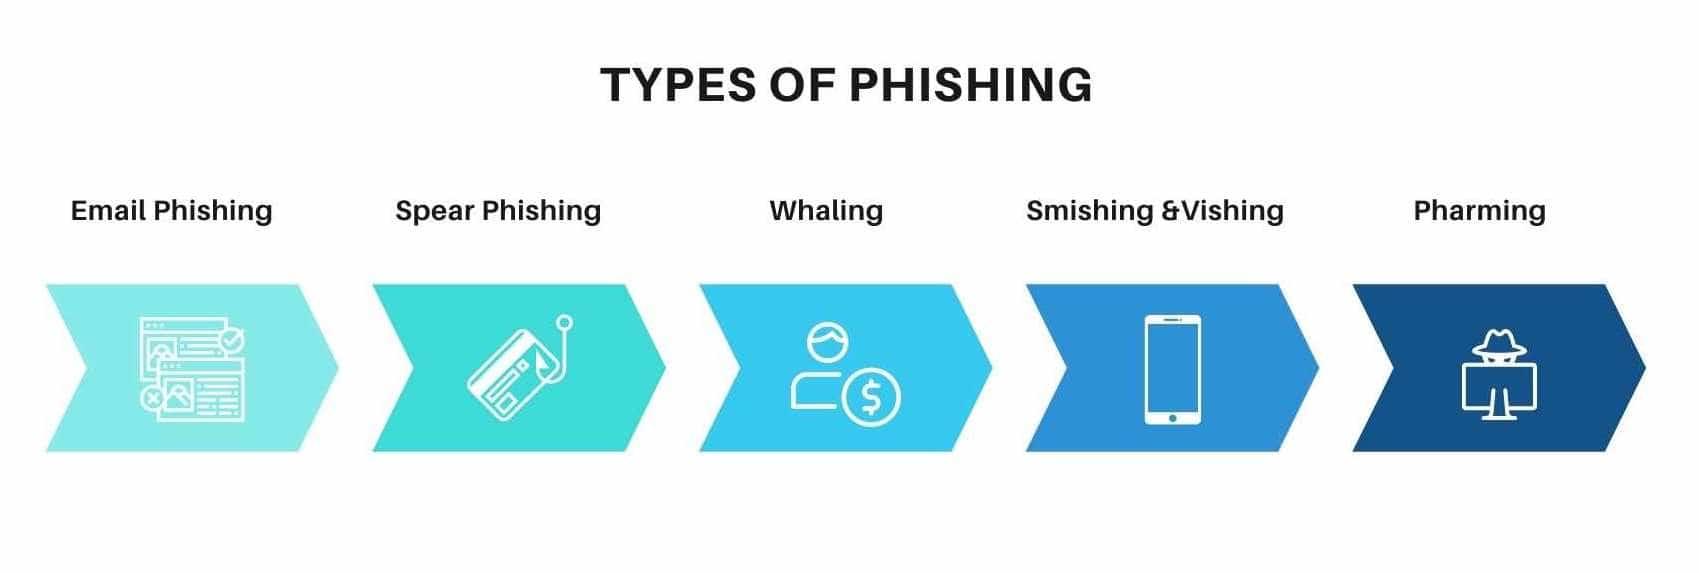 Types of phishing